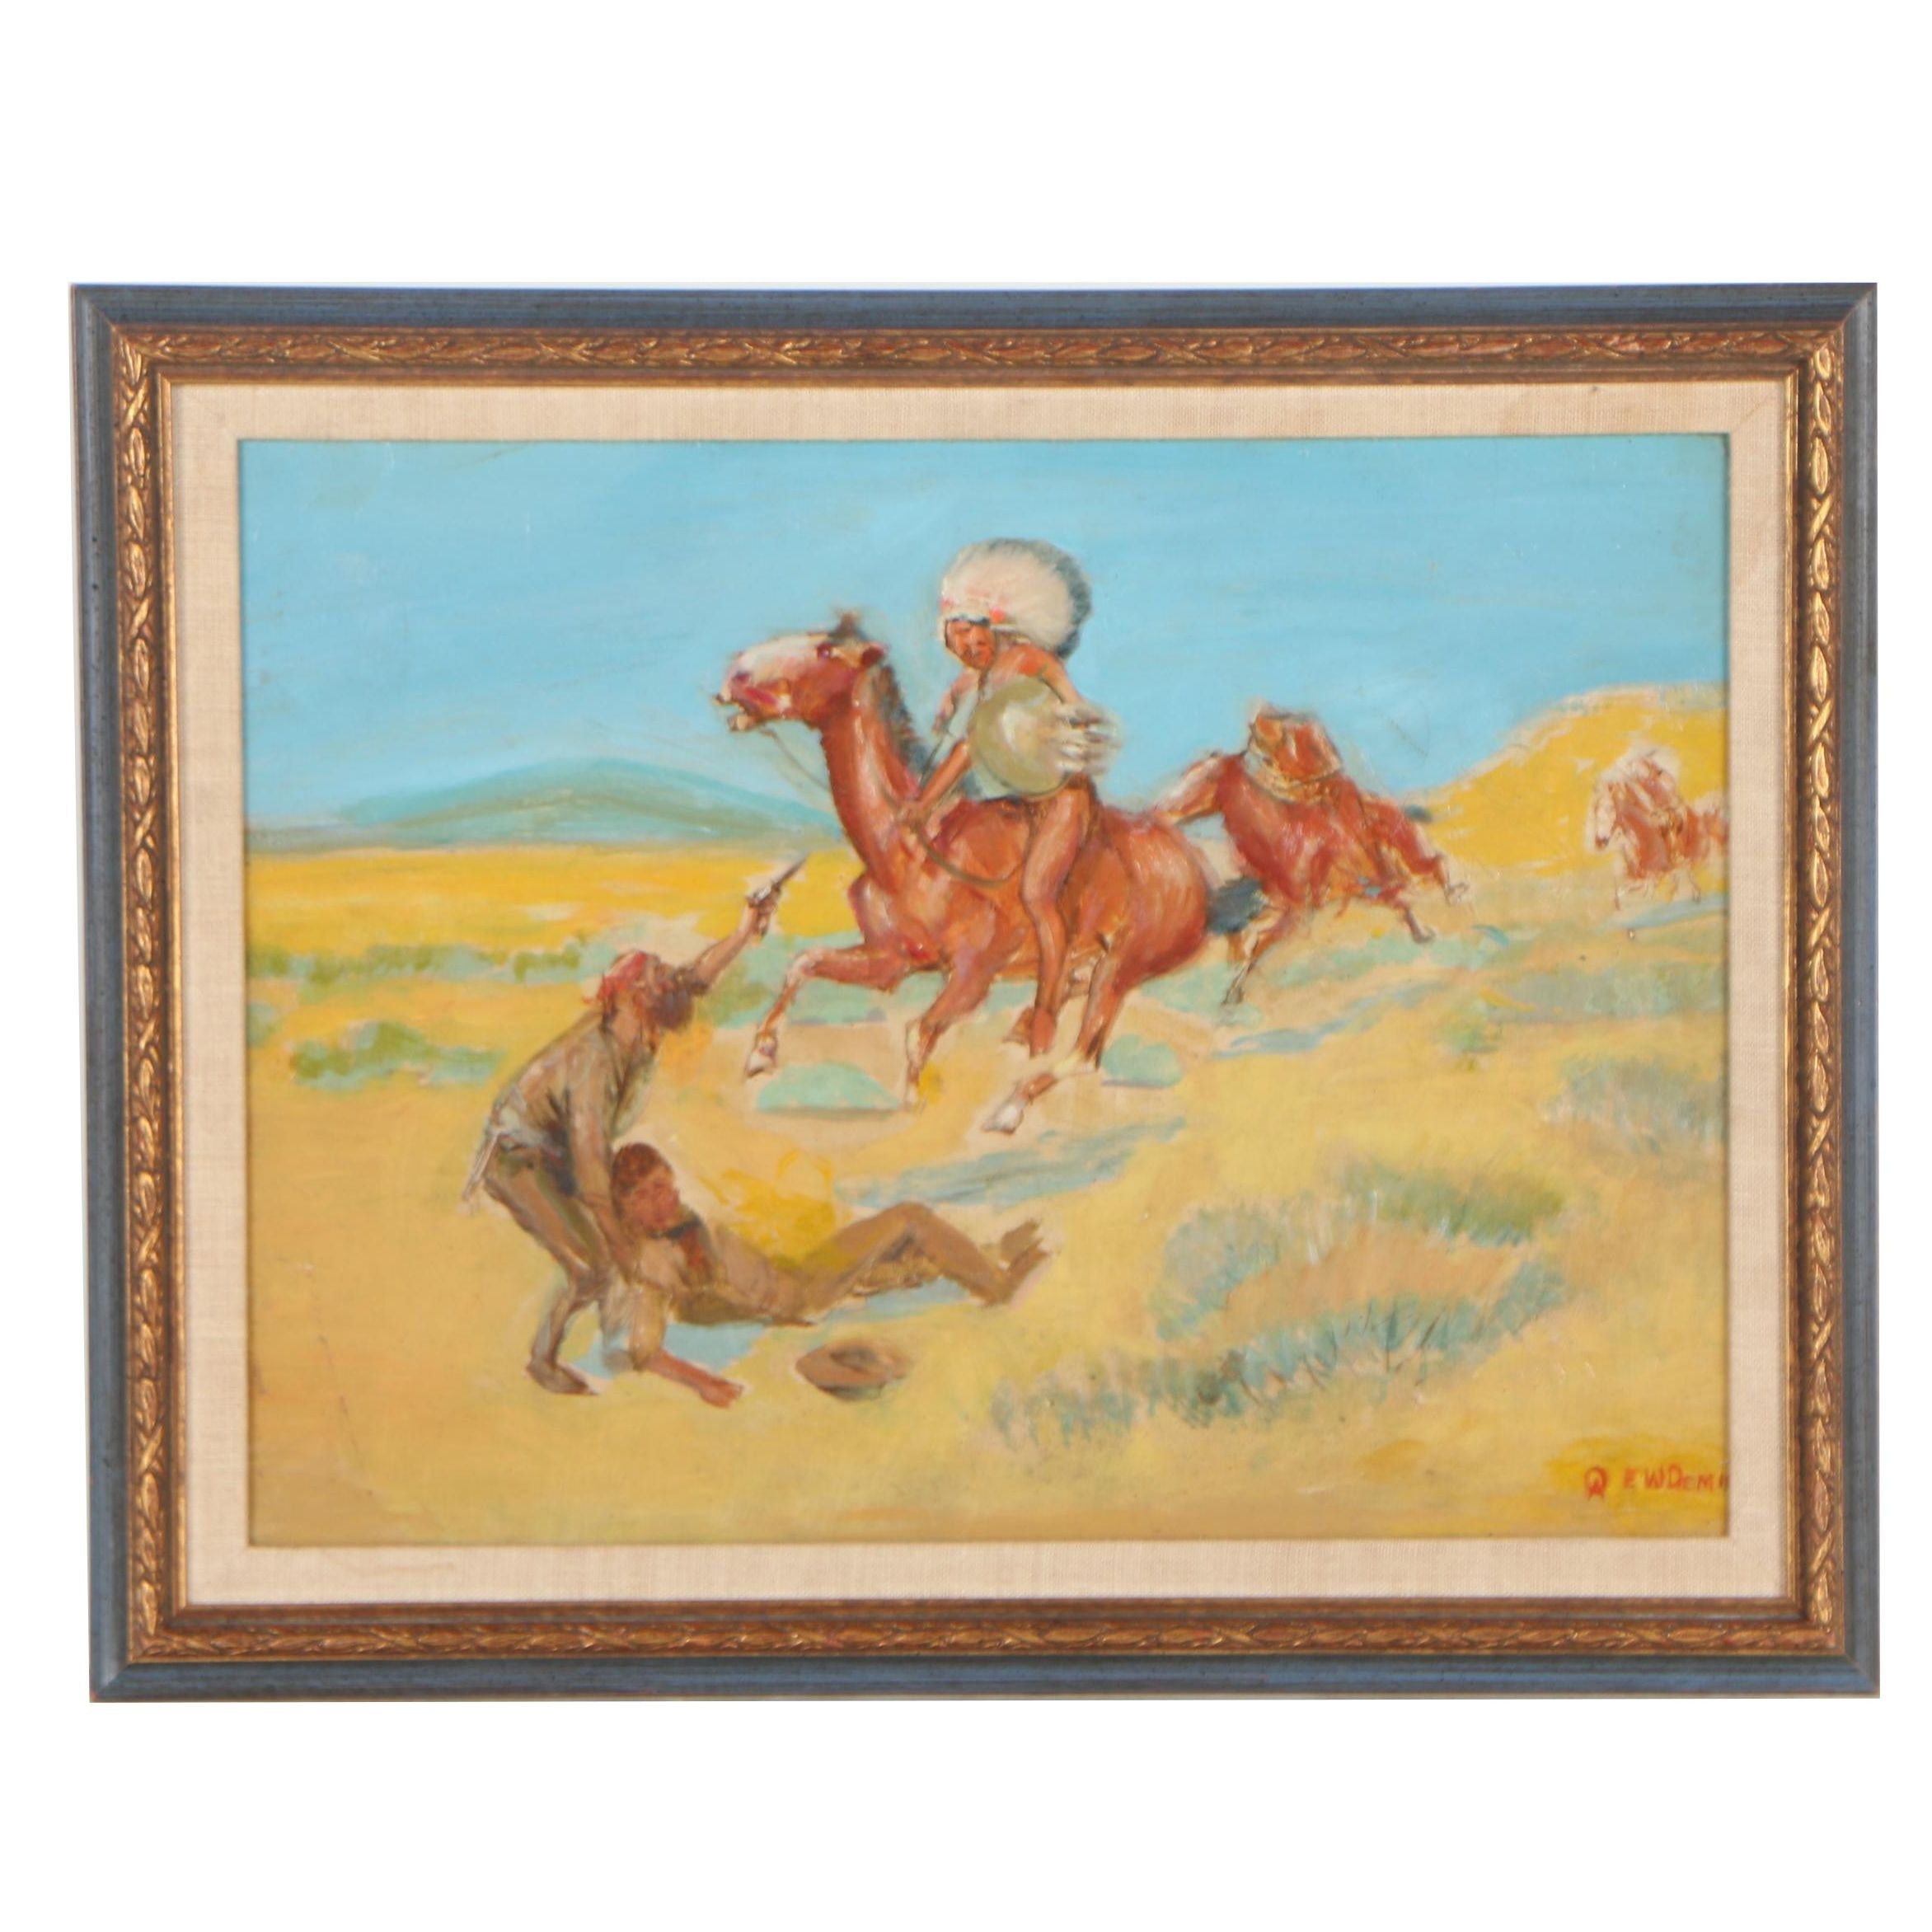 Edwin Willard Deming Oil Painting